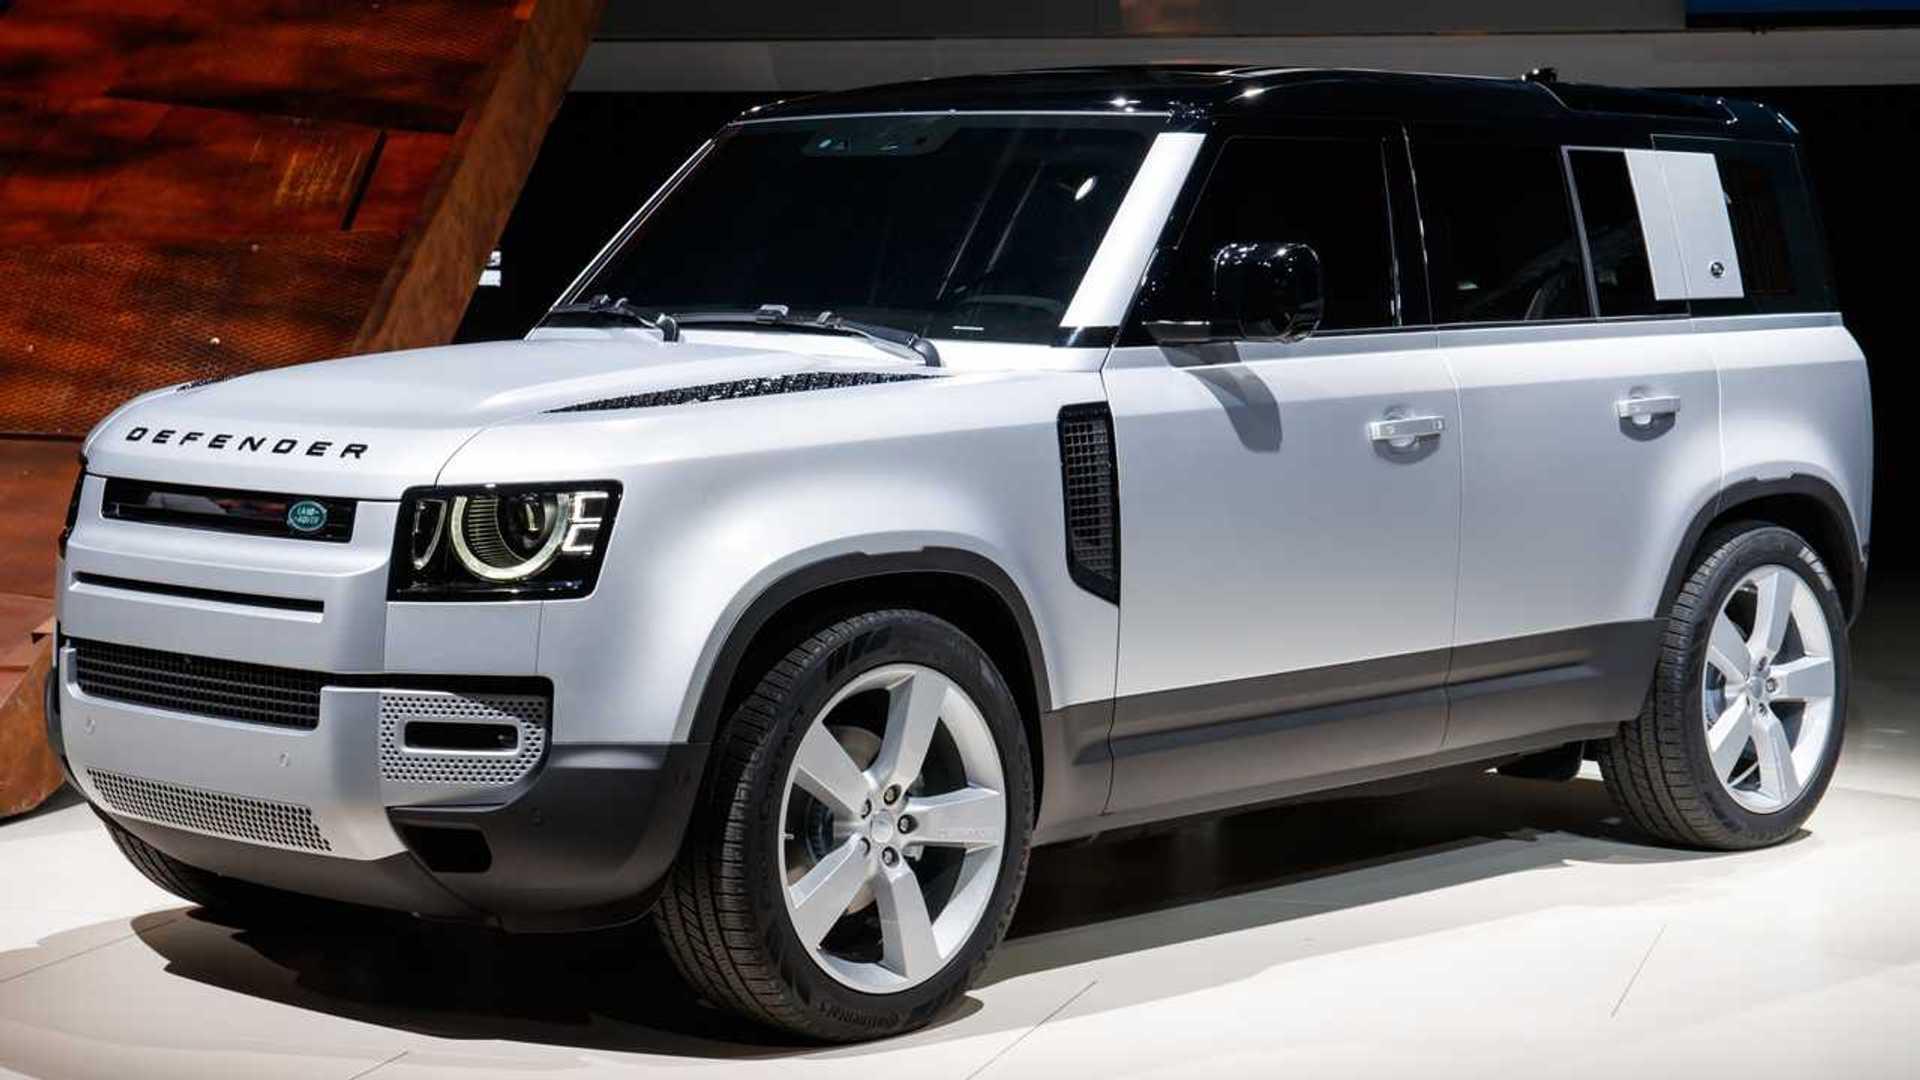 Land Rover Defender SVR To Get BMW Engine With 500 Horsepower?